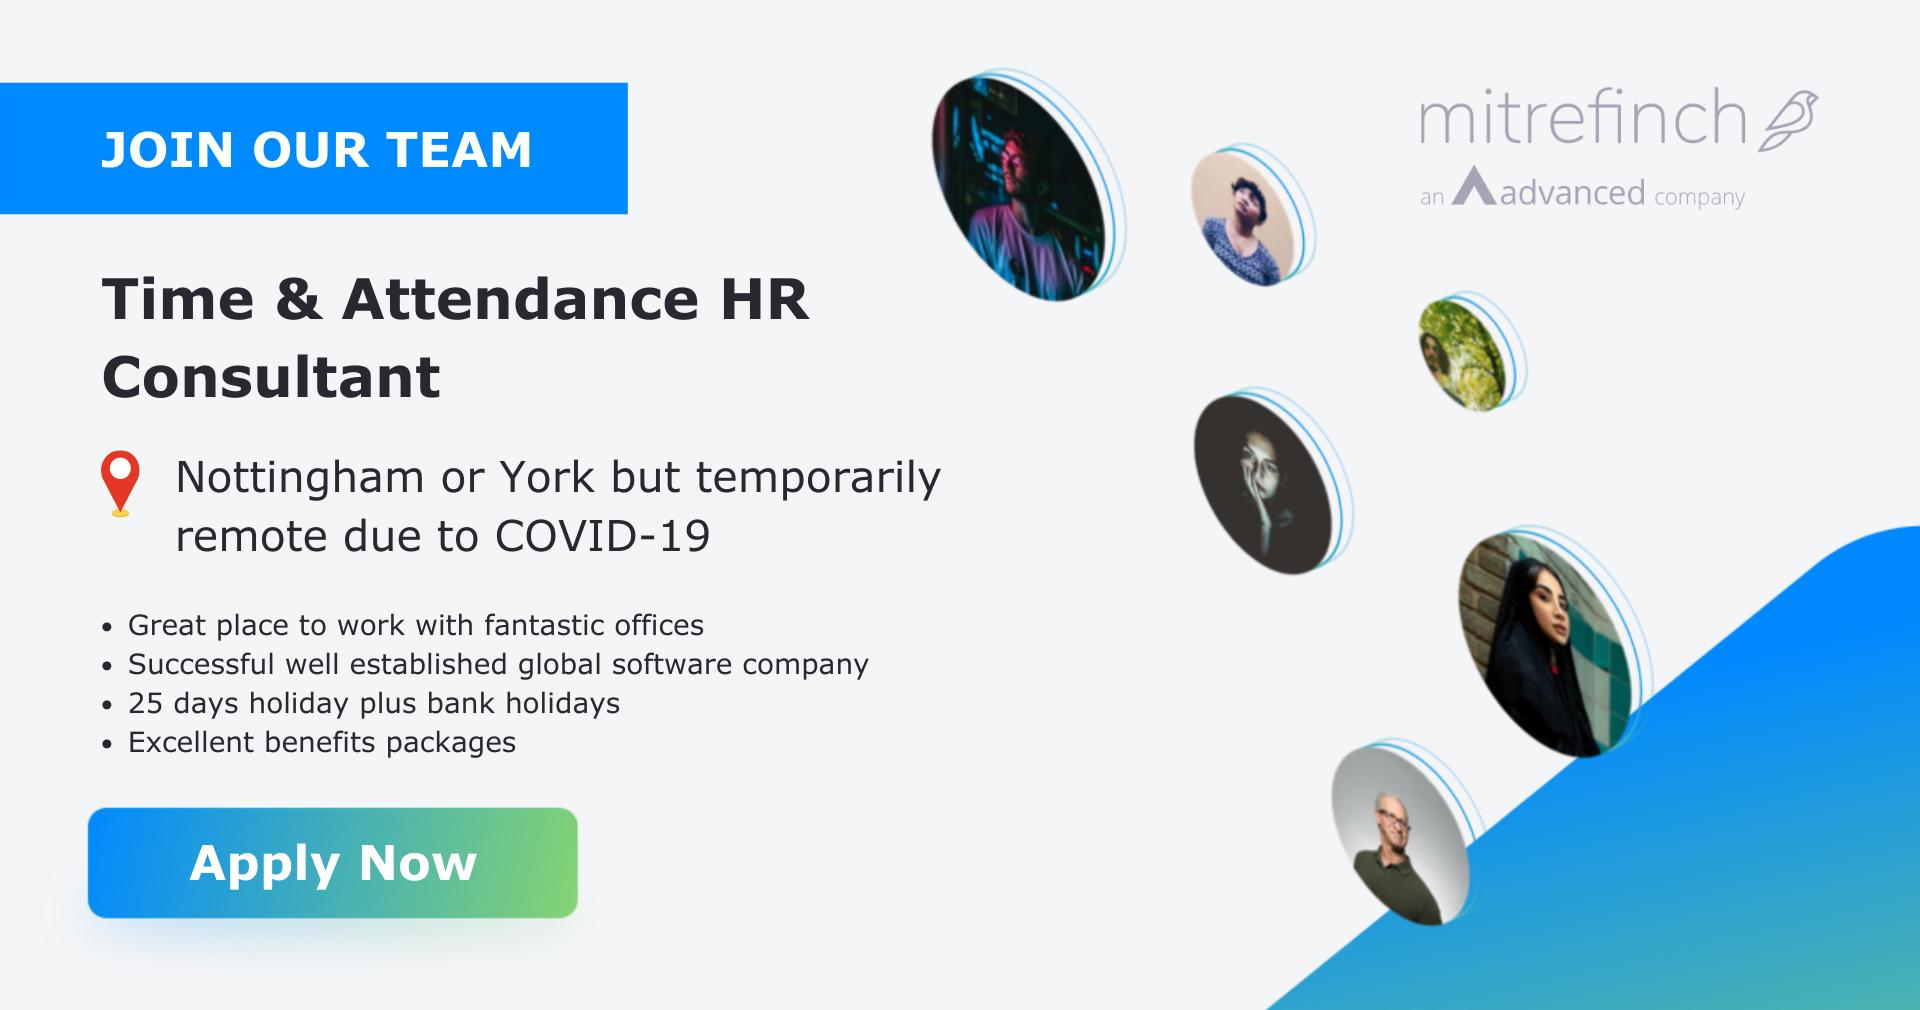 Time & Attendance HR Consultant   Mitrefinch